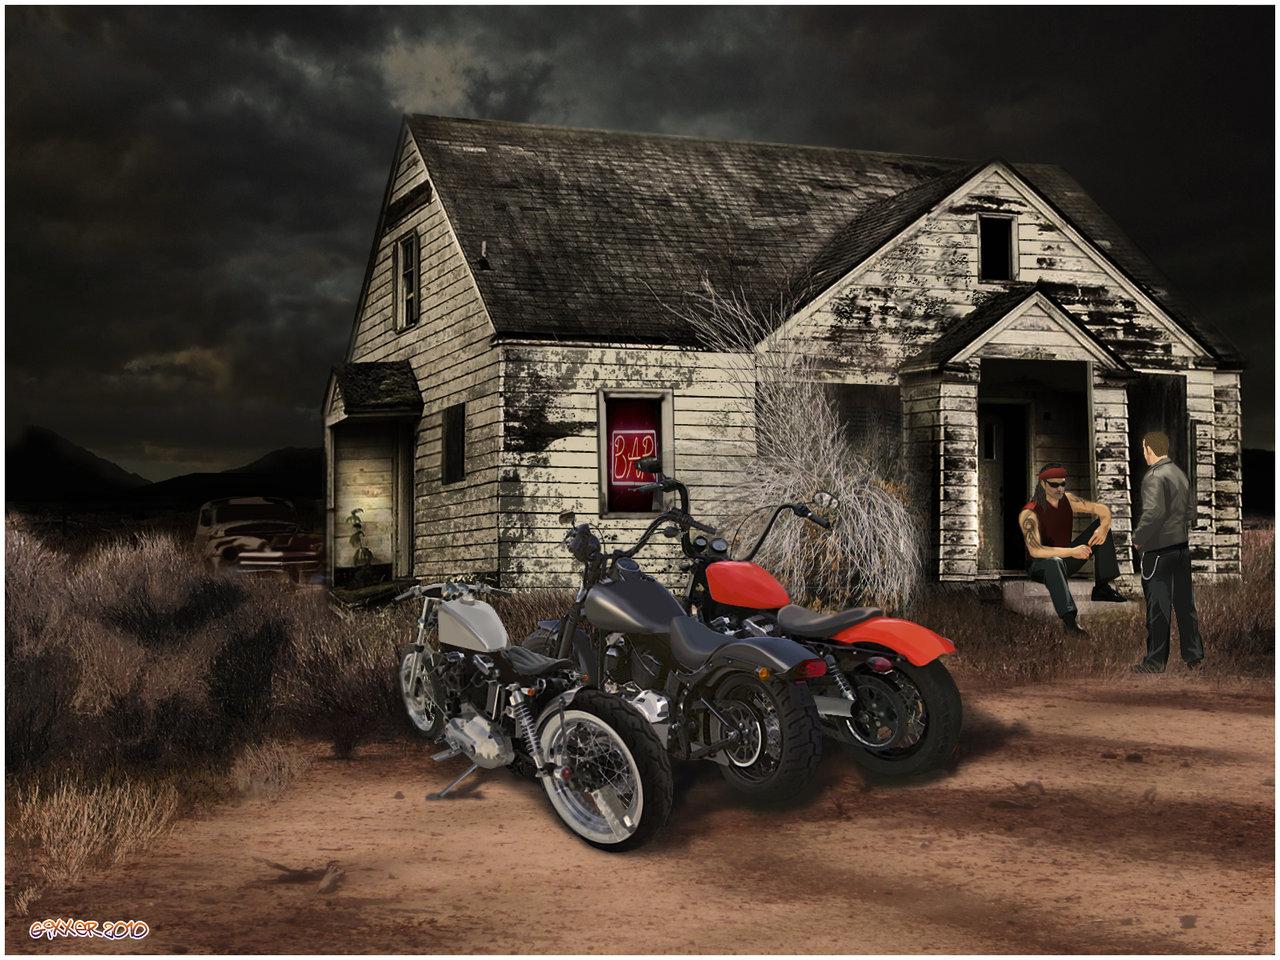 Outlaw biker bar by Gixxerman 1280x960